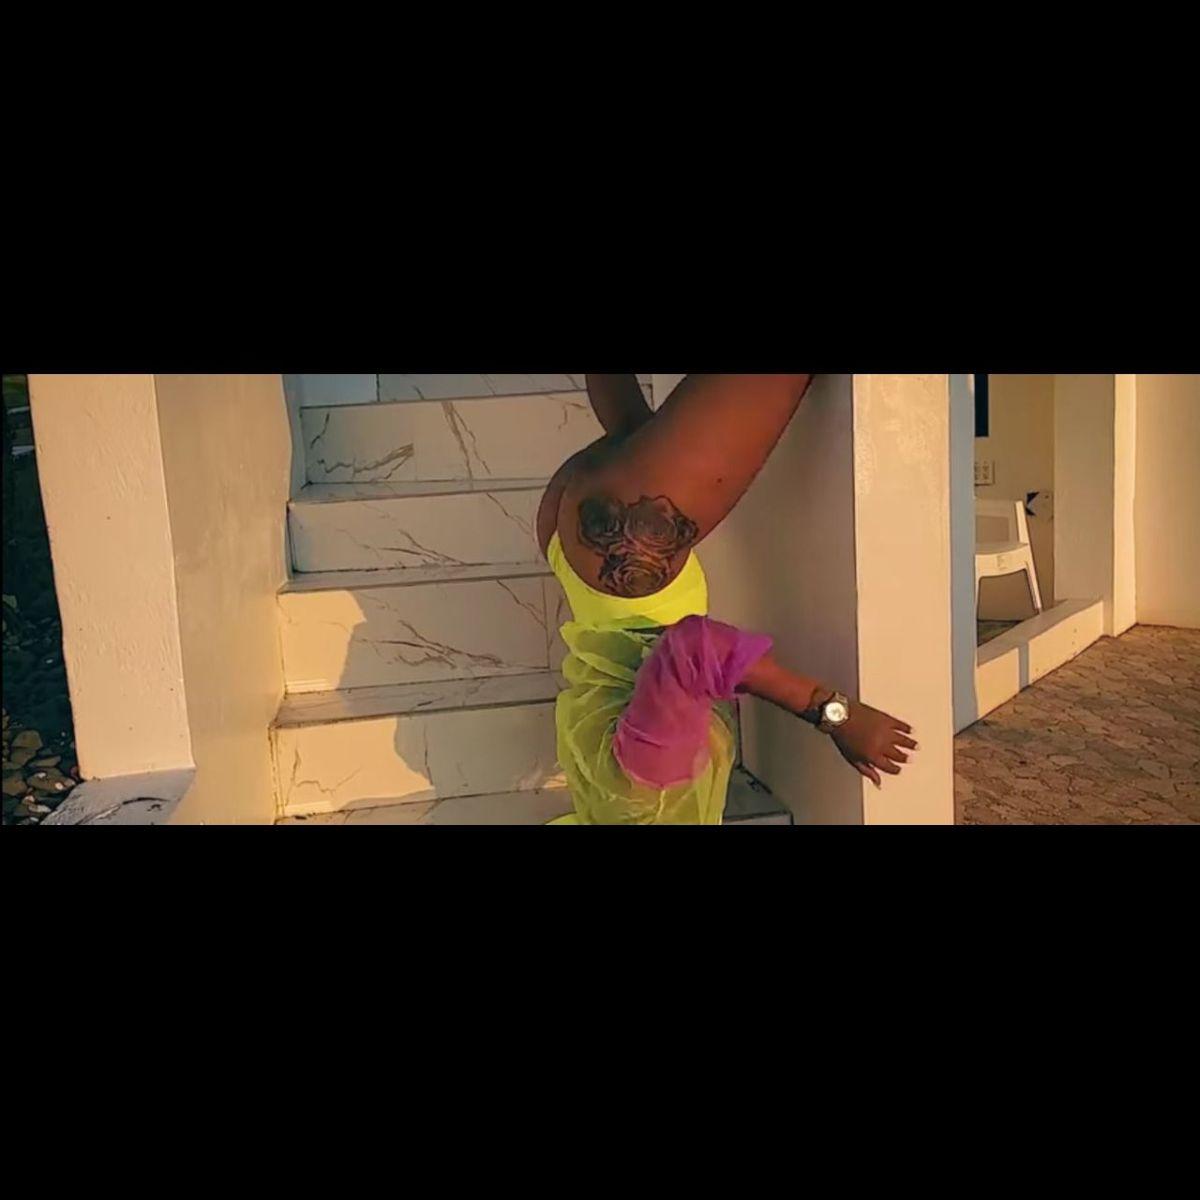 K'Coneil - Quarantine N Chill (Thumbnail)